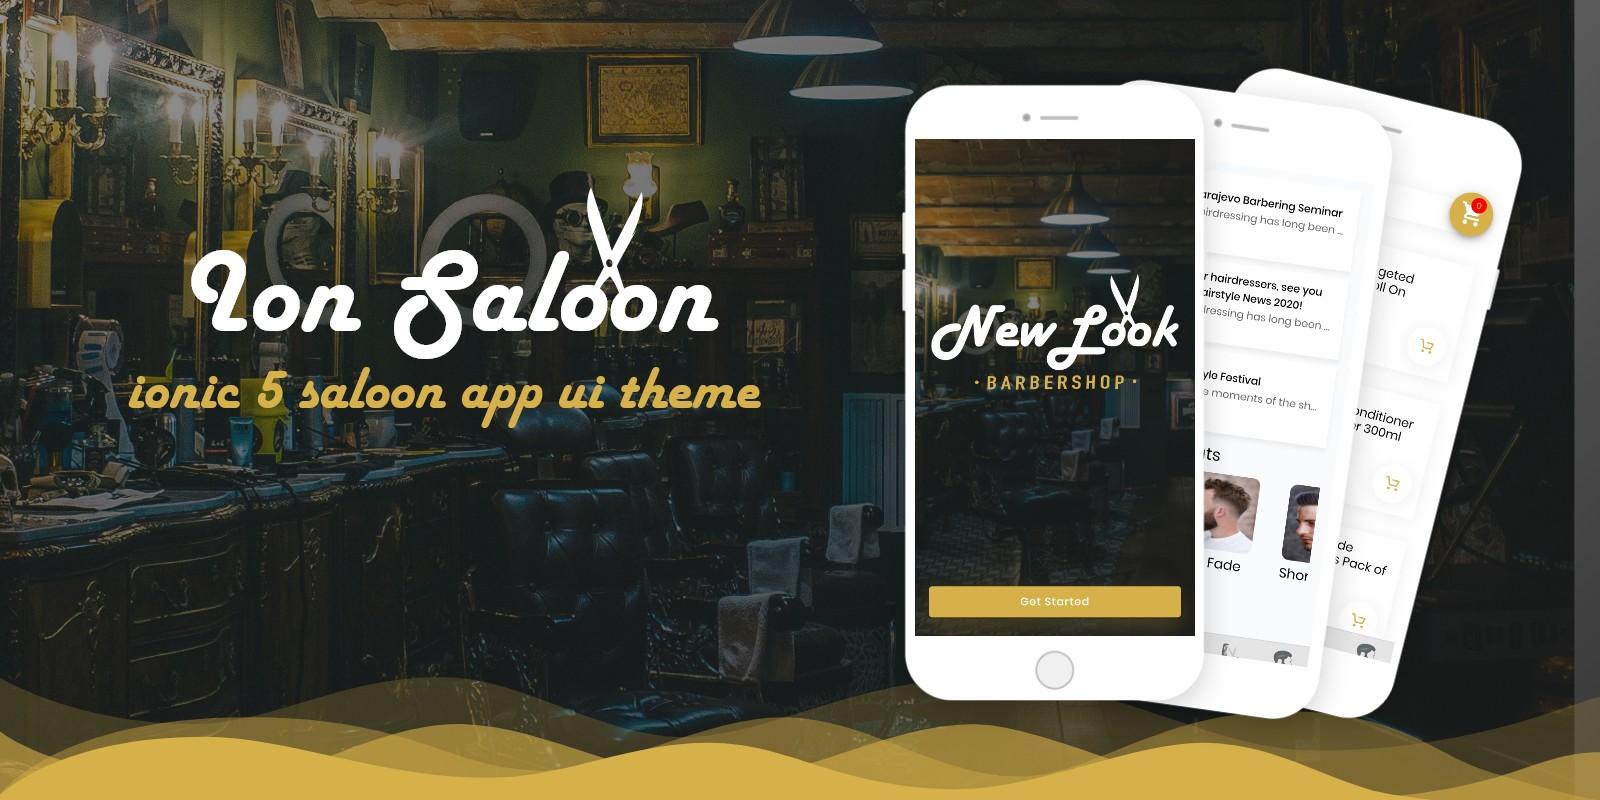 Ion Saloon - Ionic 5 Barbershop UI Theme